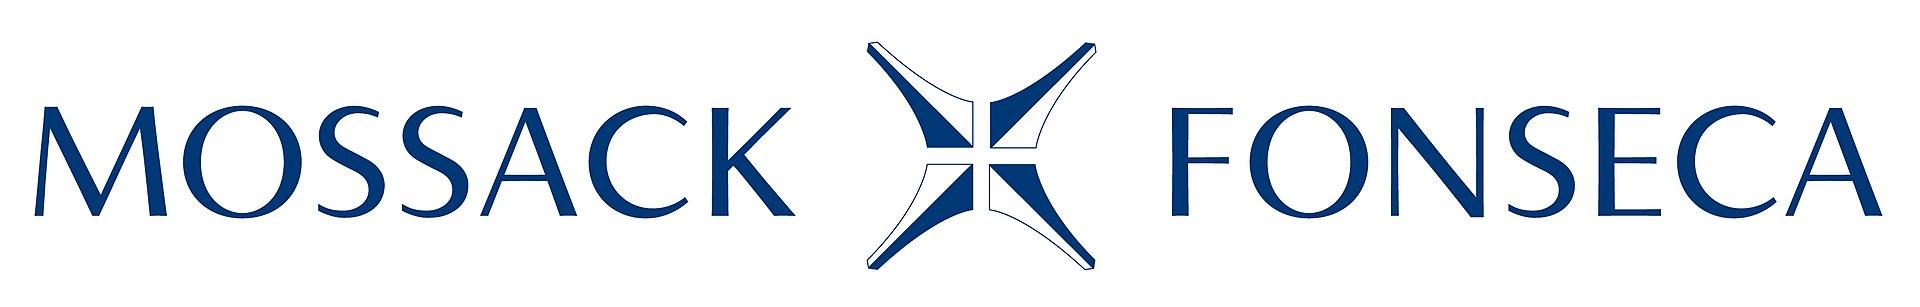 Mossack Fonseca Logo.jpg